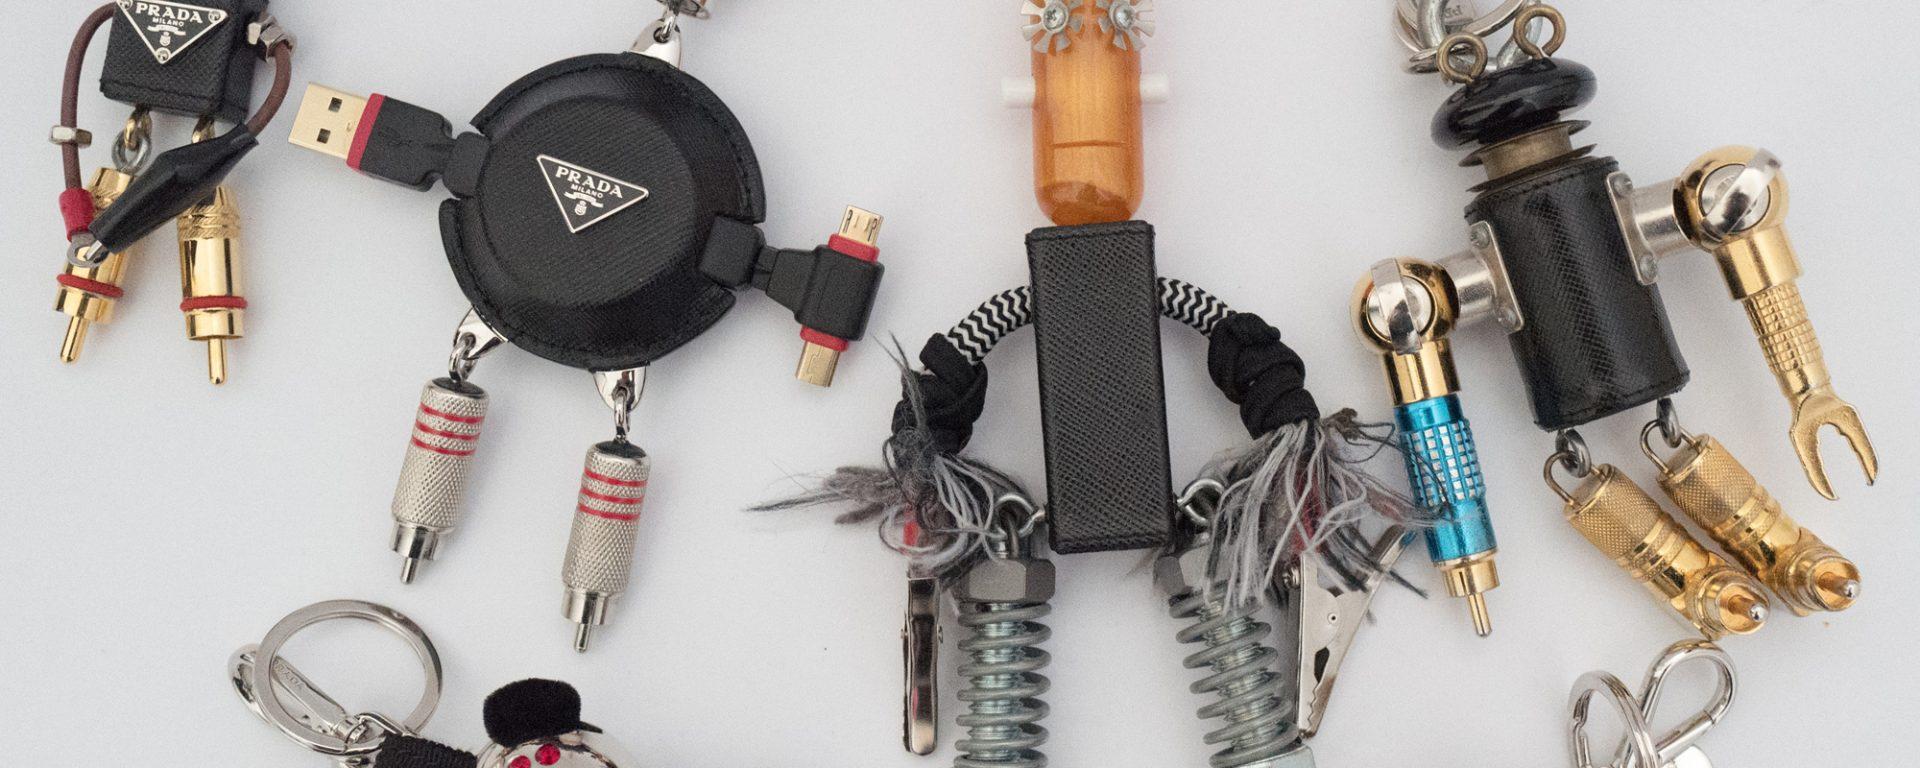 Prada Robin Robot Trick Key Chain nDMIW